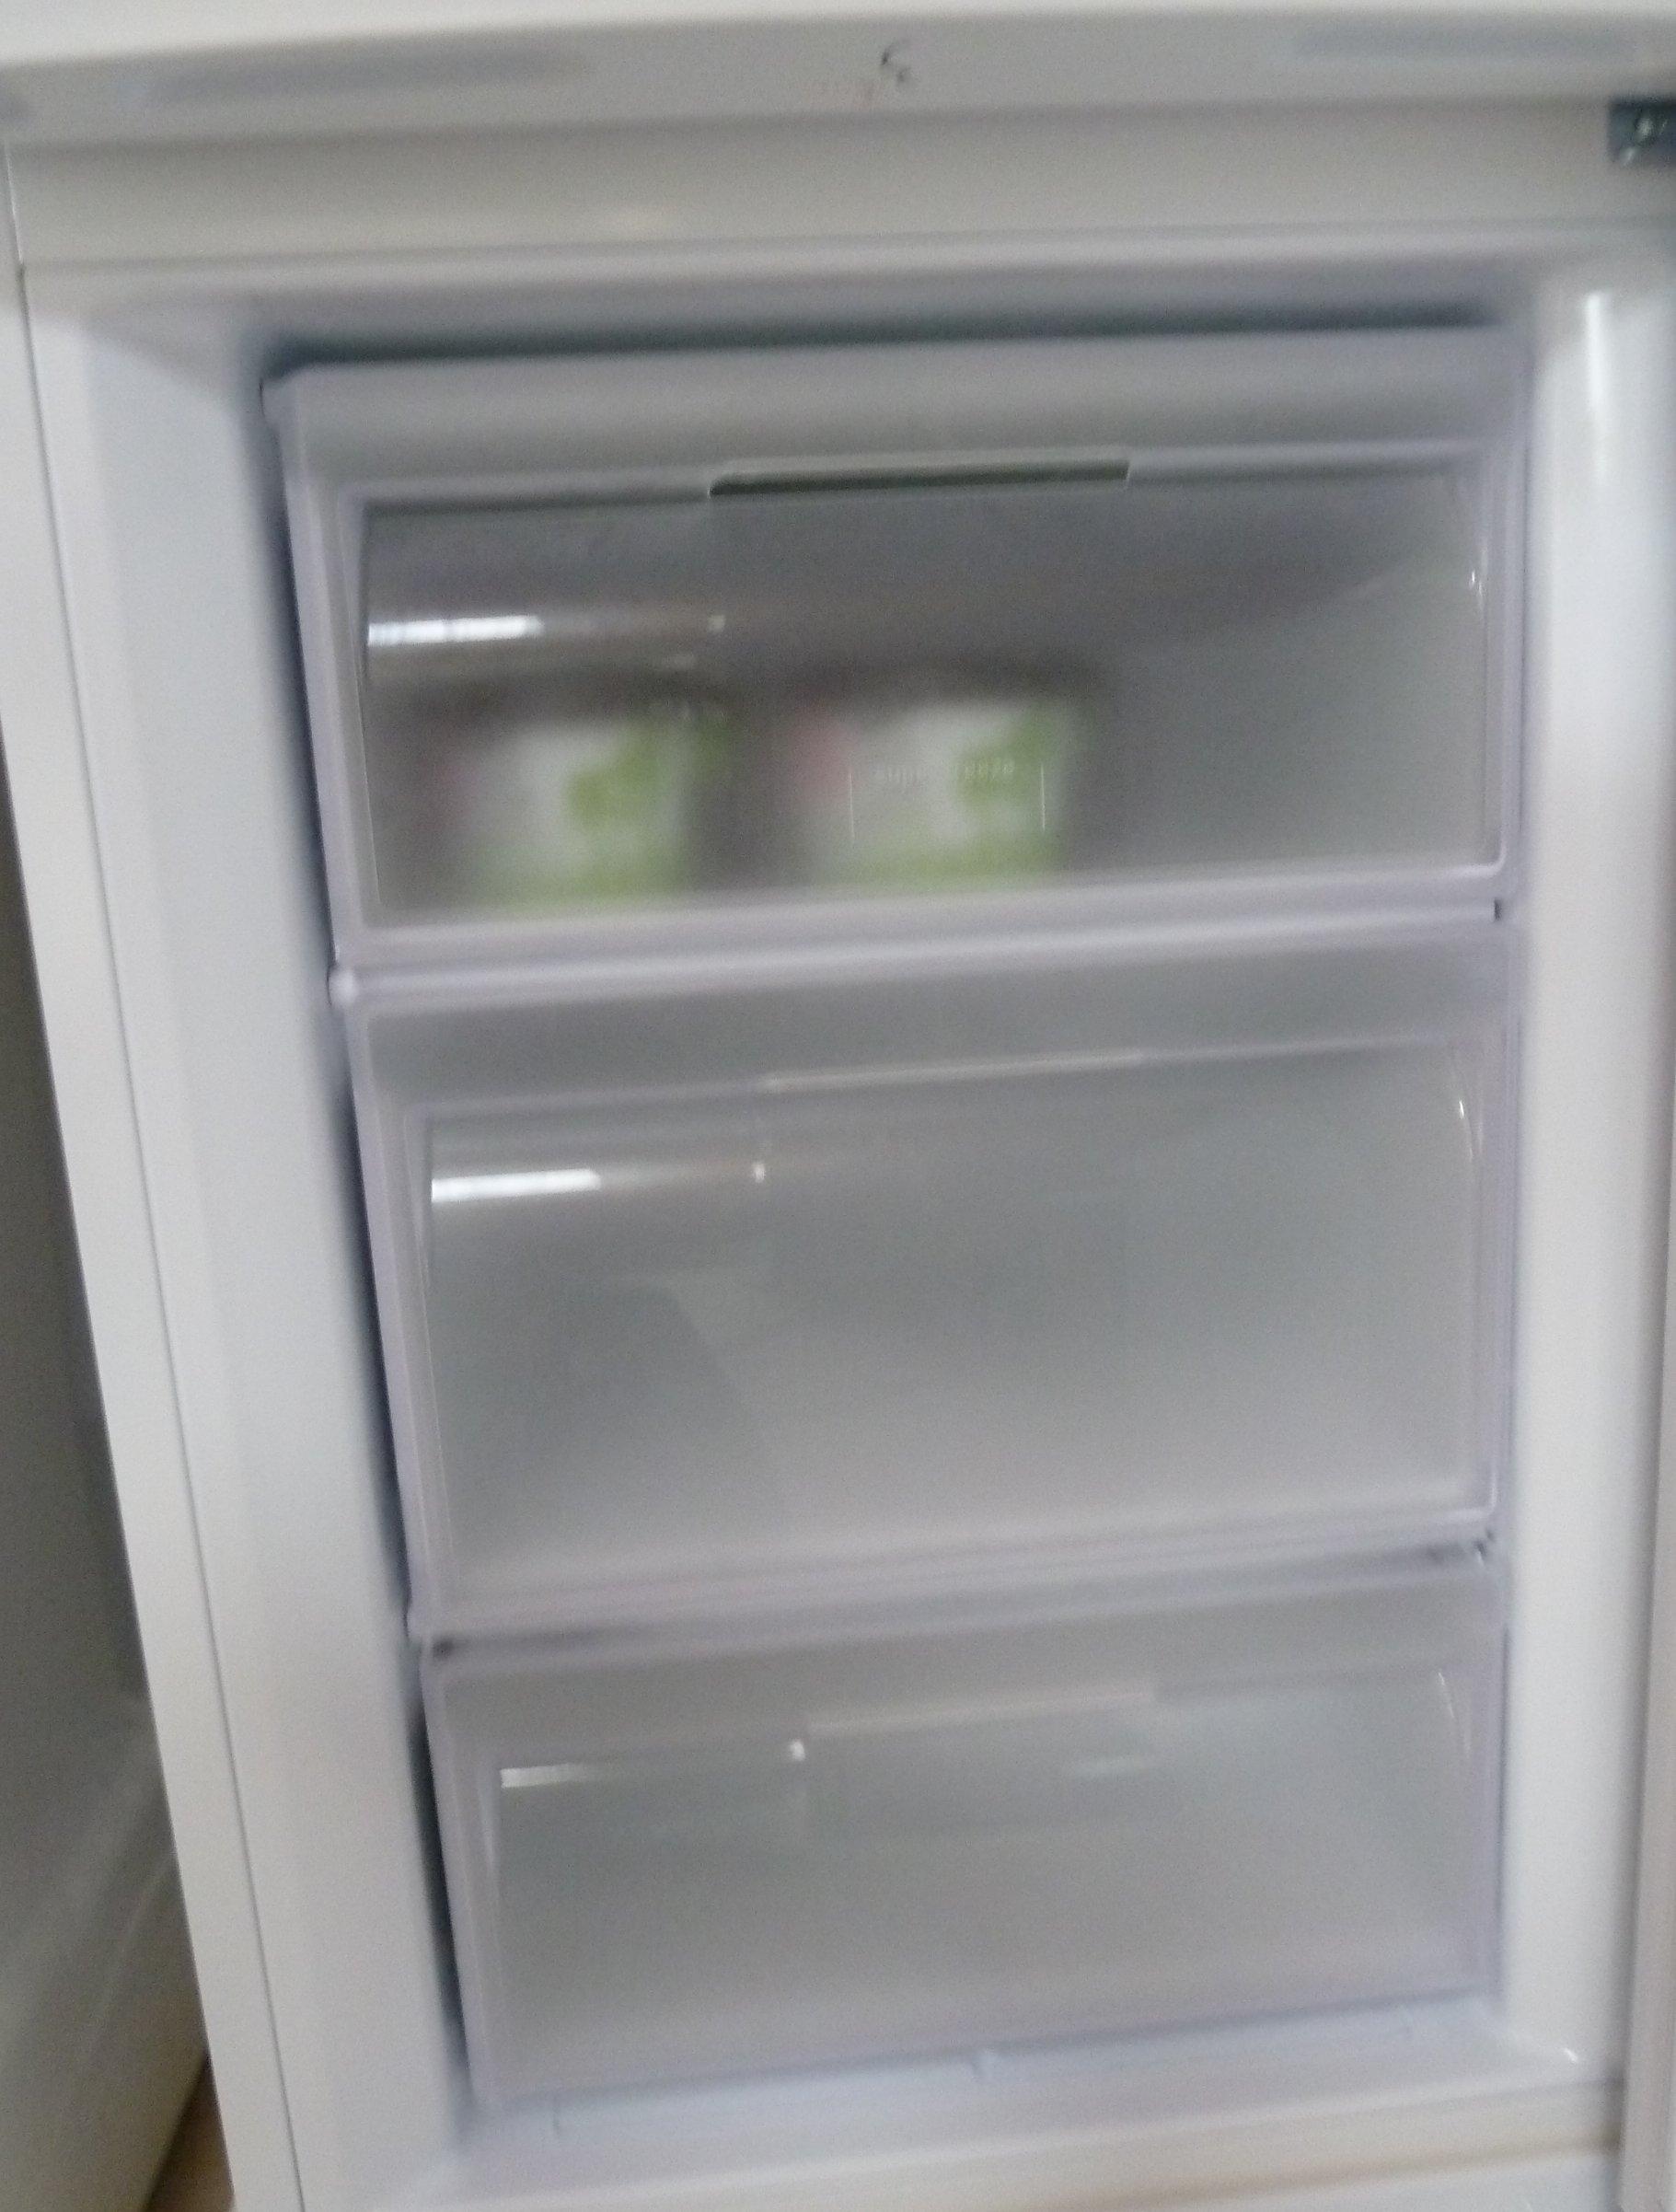 hotpoint str175wp fridge freezer review dragons and. Black Bedroom Furniture Sets. Home Design Ideas